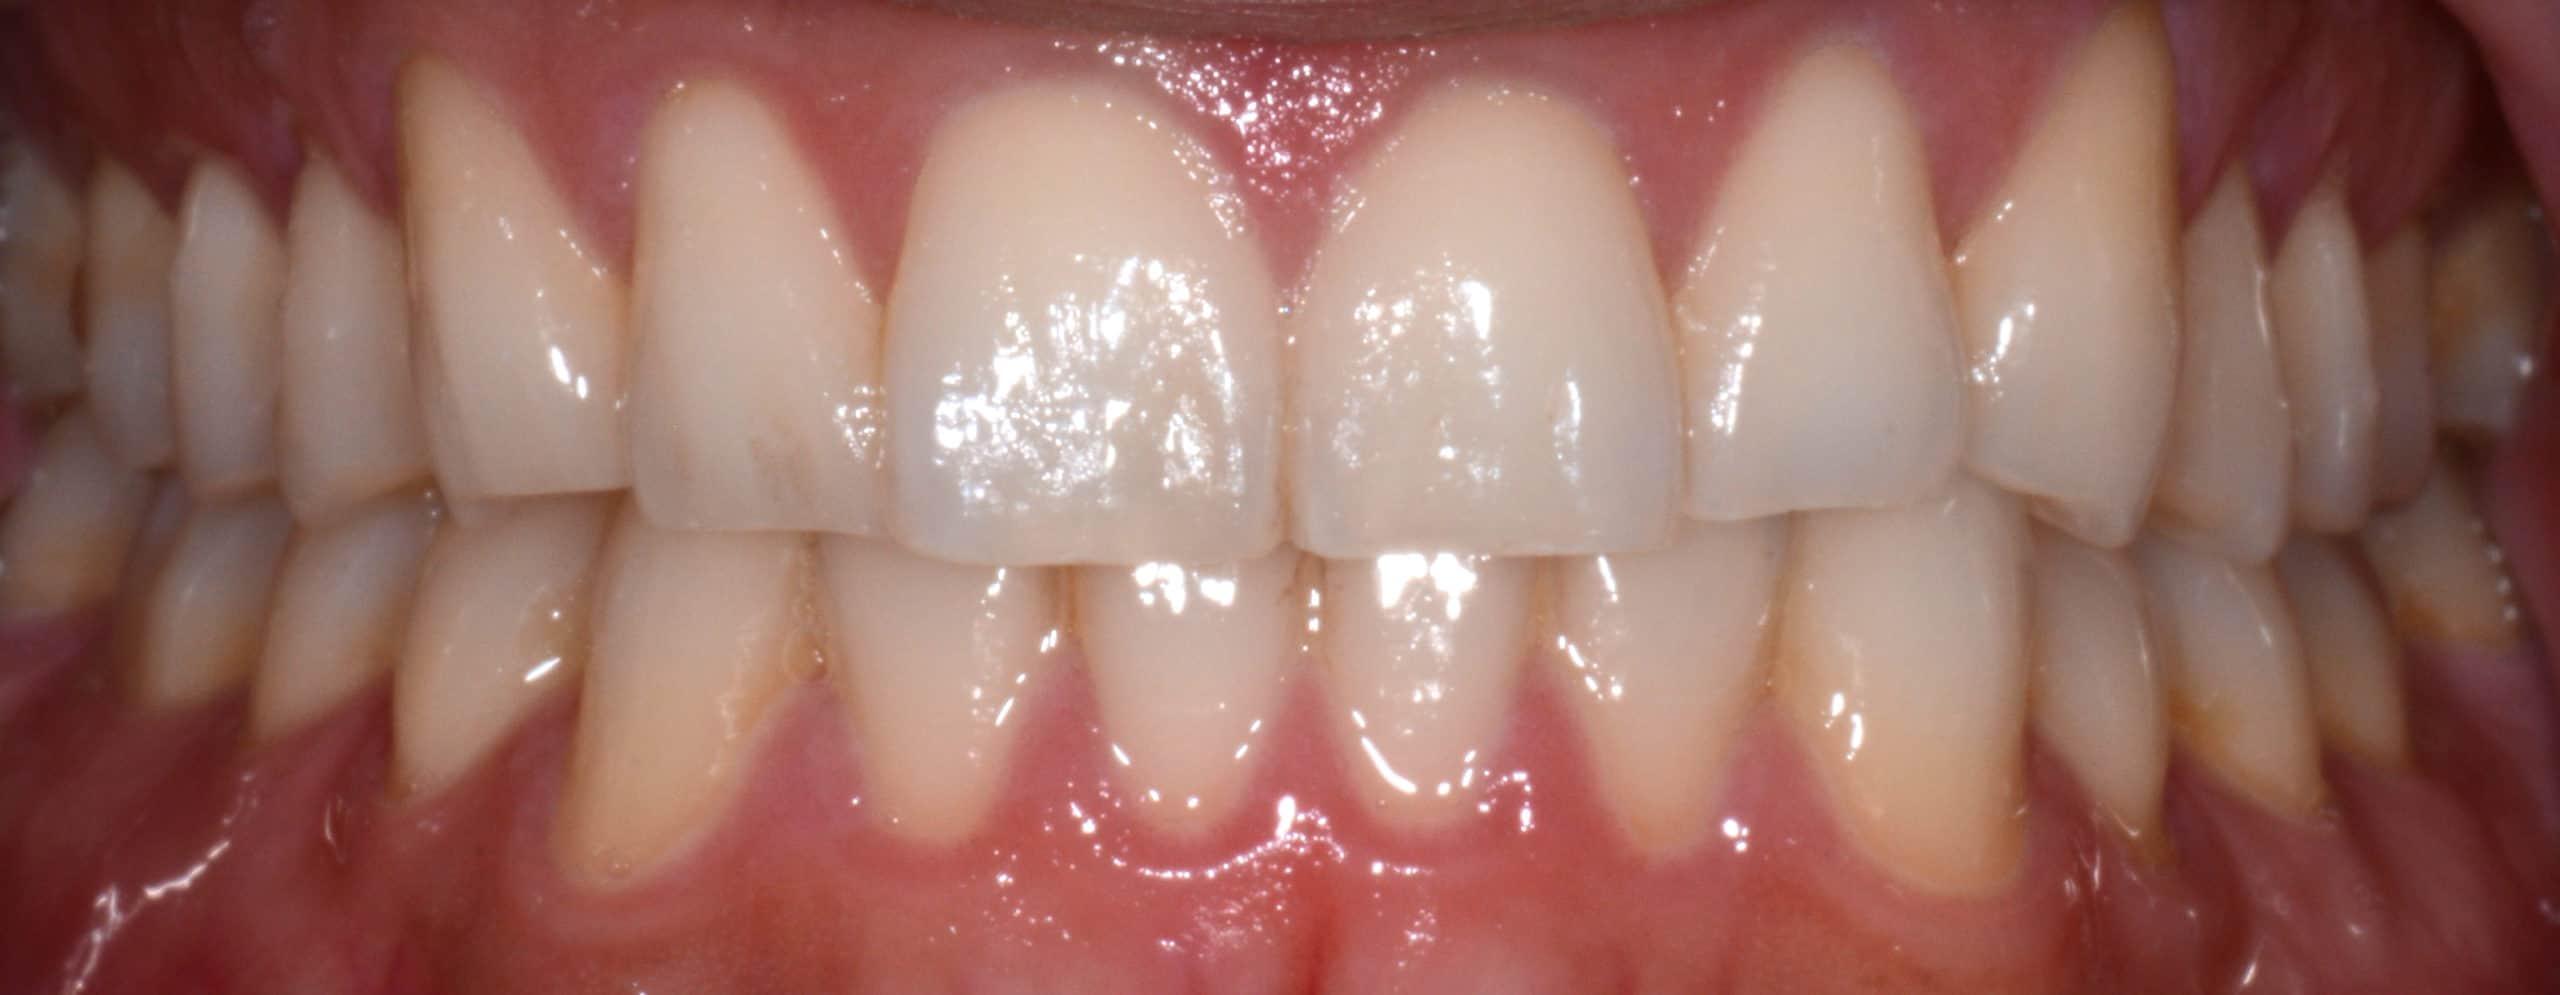 Dental before & after photos - Suezaki Family Dentistry in San Jose, CA